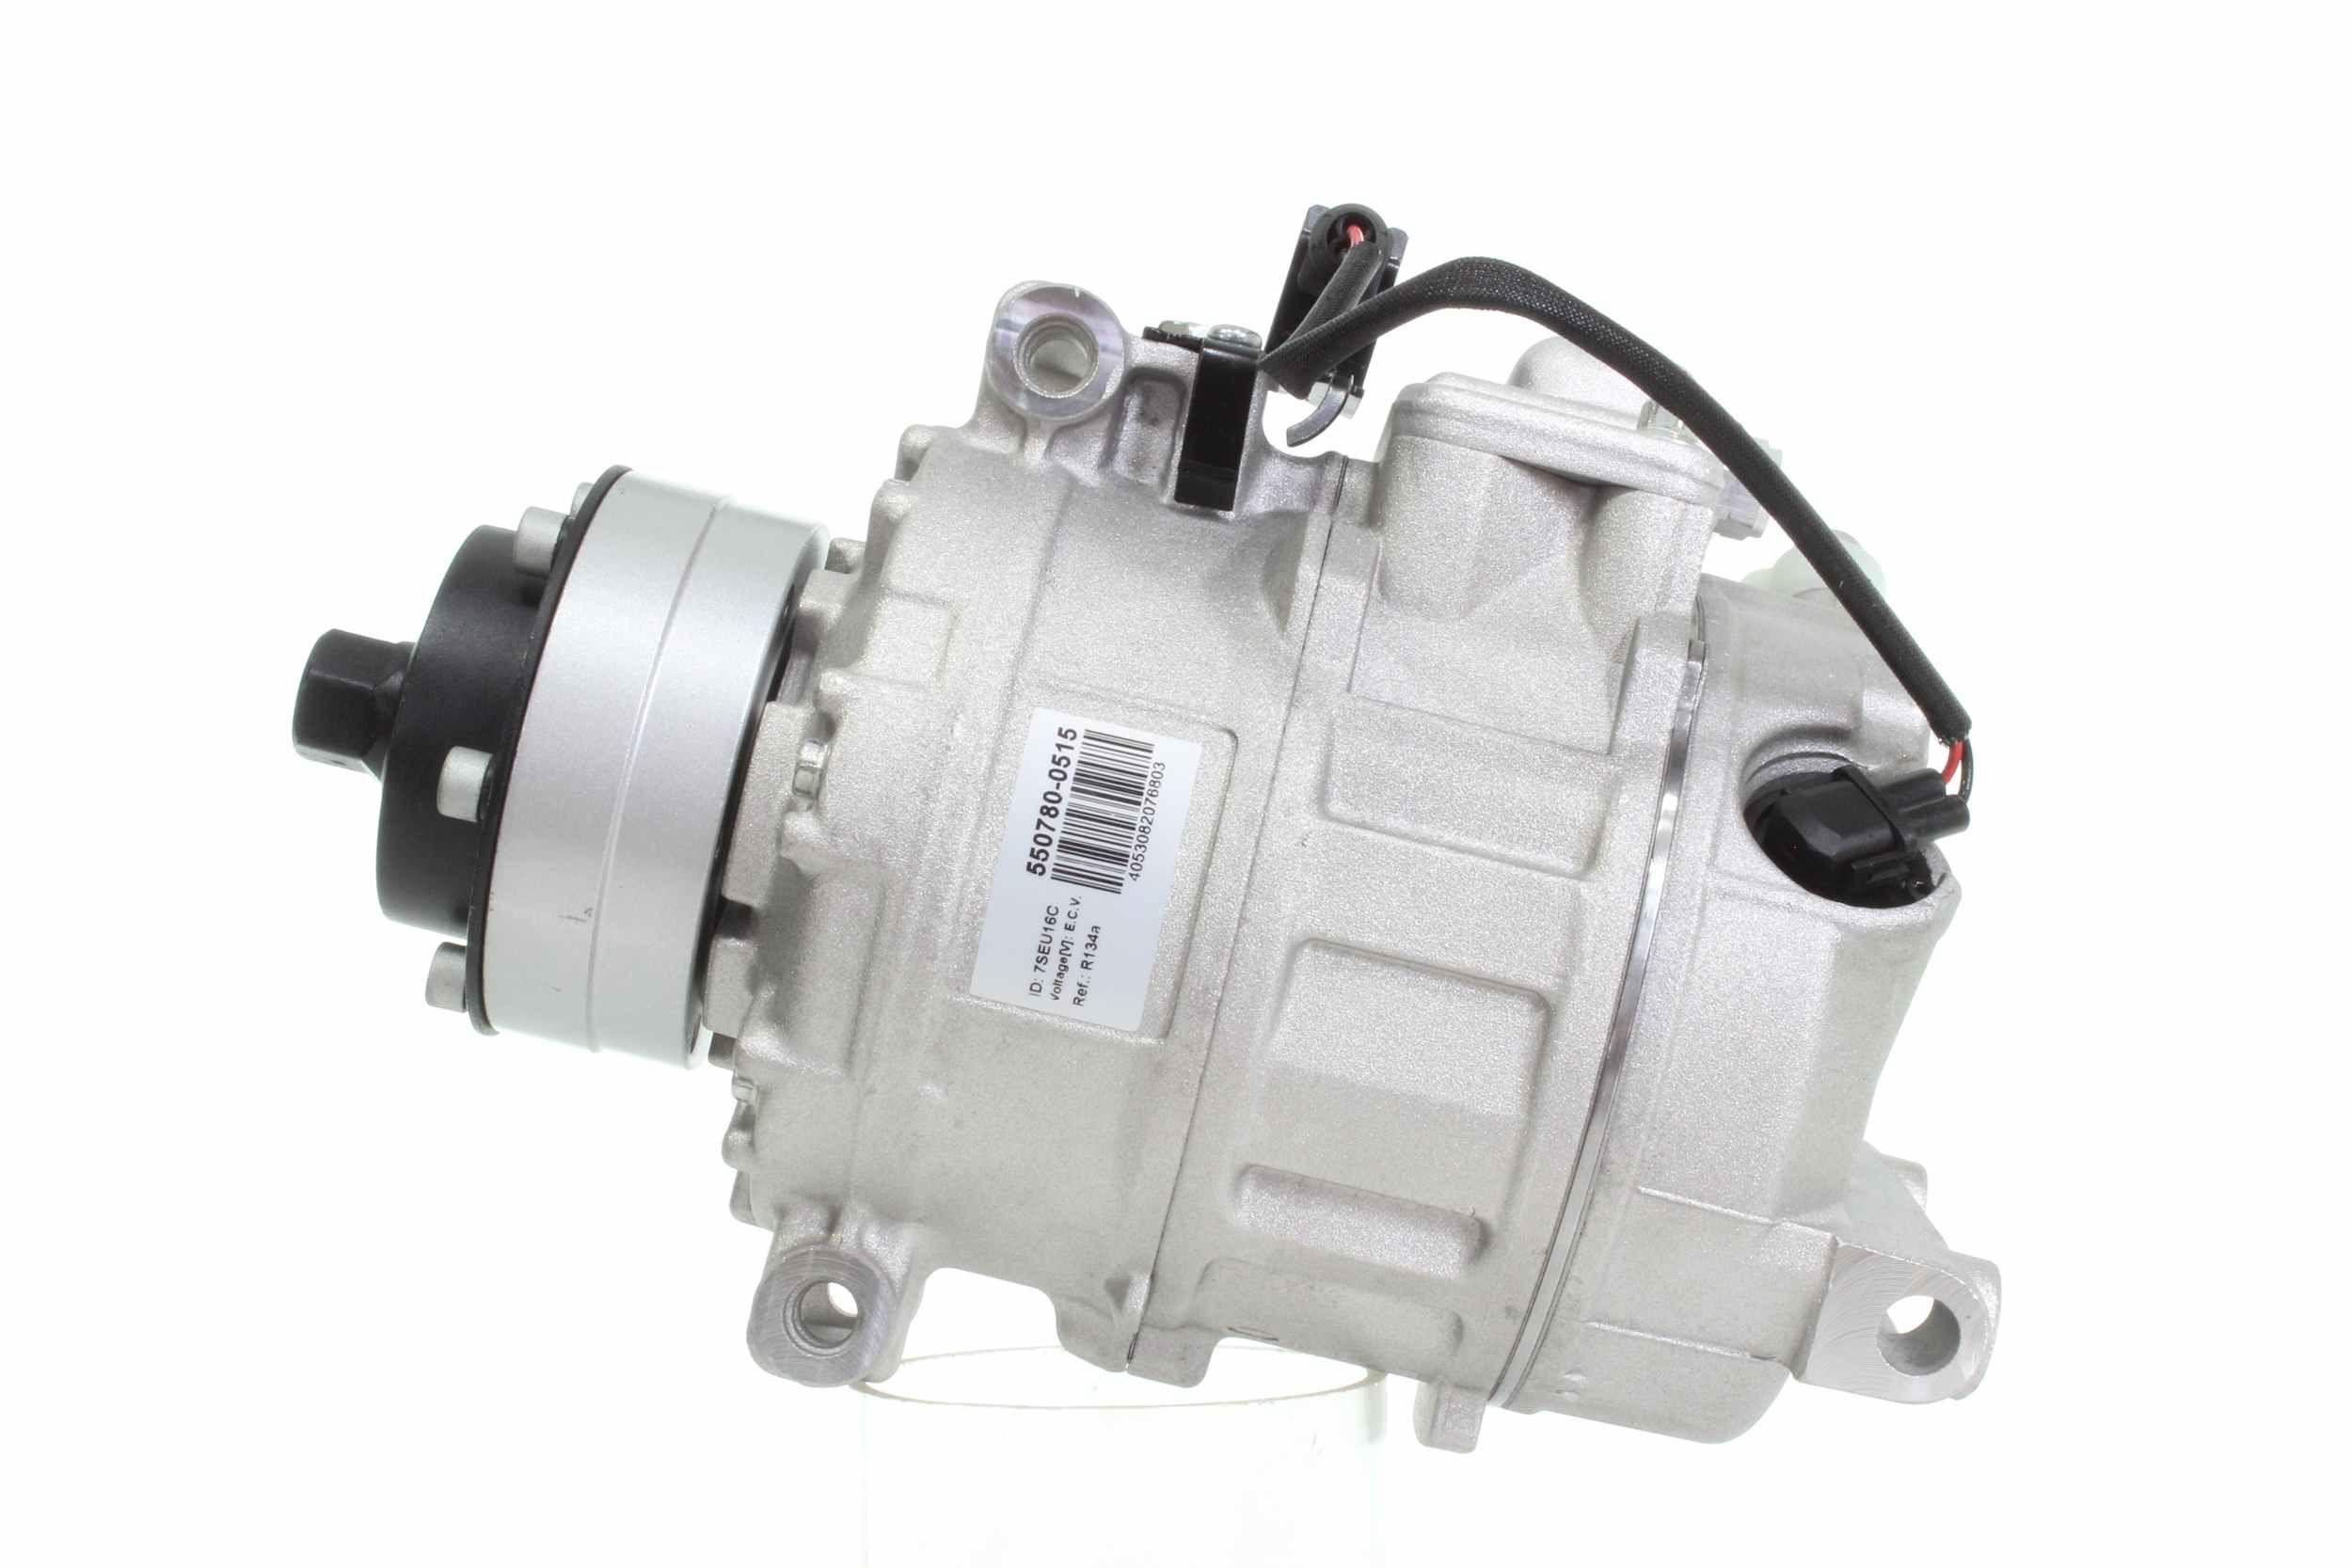 7SEU17C ALANKO PAG 46, Kältemittel: R 134a Klimakompressor 10550780 günstig kaufen